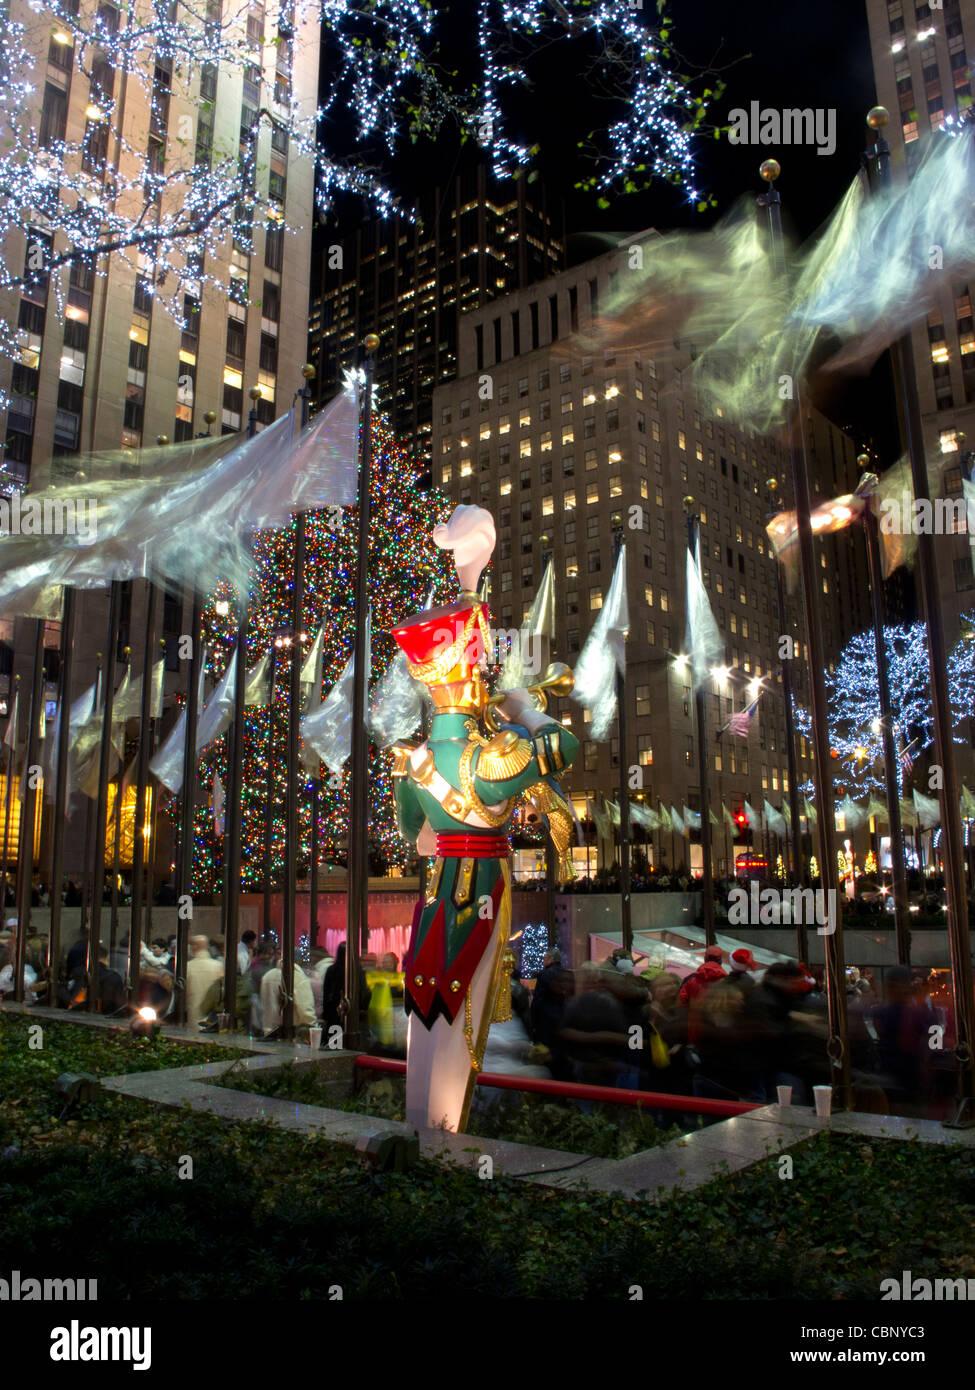 Giant Christmas Figures at Rockefeller Plaza at Christmas at Night,New York City, New York, USA Stock Photo